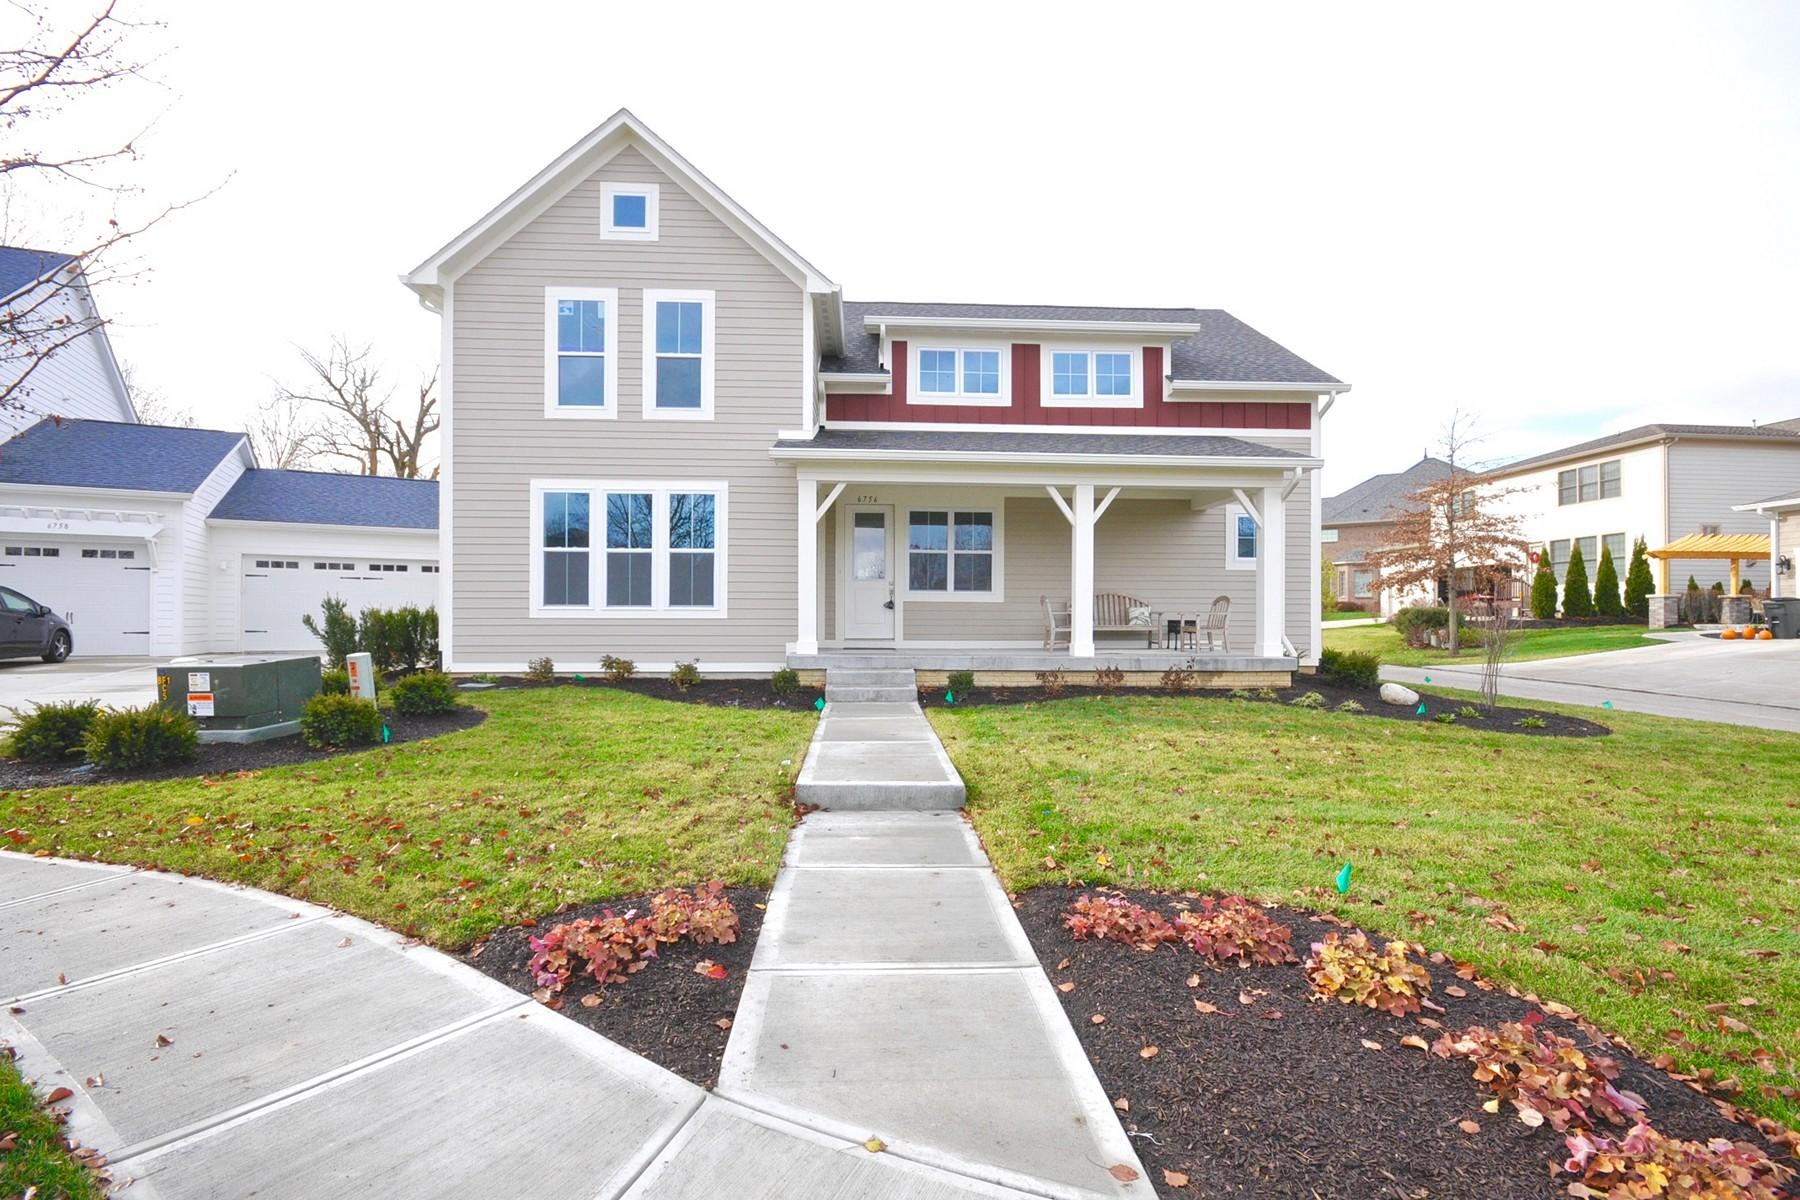 獨棟家庭住宅 為 出售 在 The Finest Finishes 6756 Chapel Crossing Zionsville, 印第安那州 46077 美國